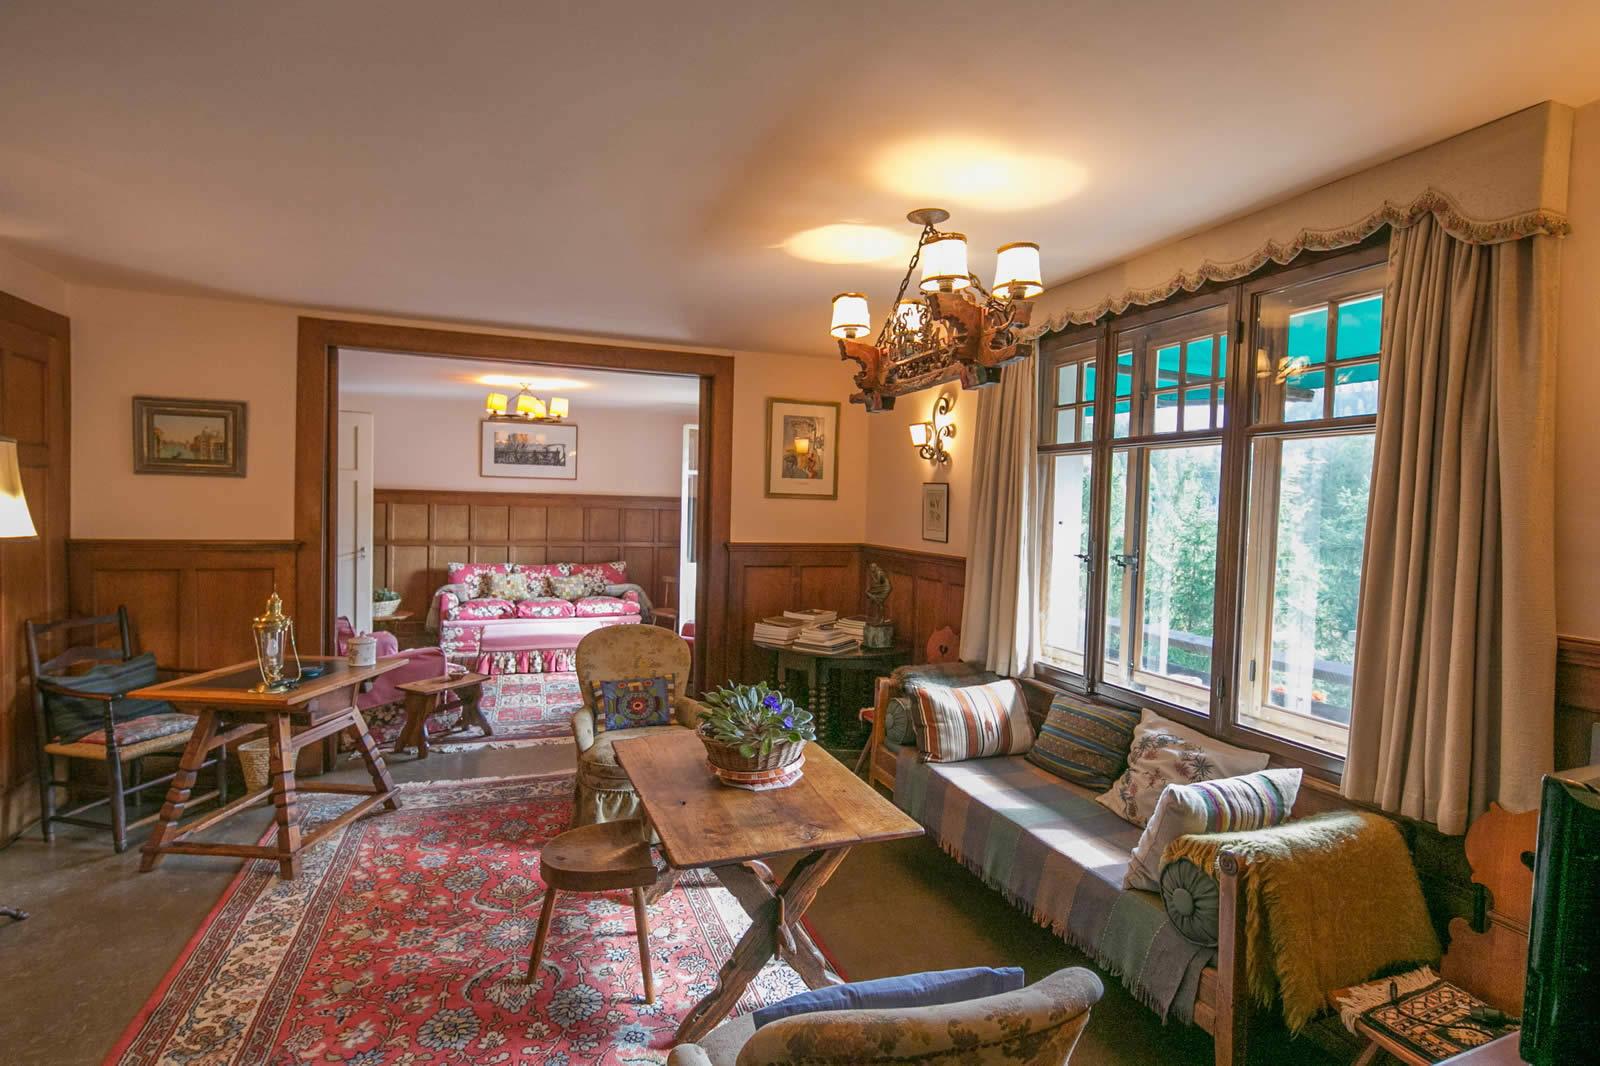 chalet-19-chambres-cheminee-imposante-piscine-privee-terrasse-pleine-montagne-a-vendre